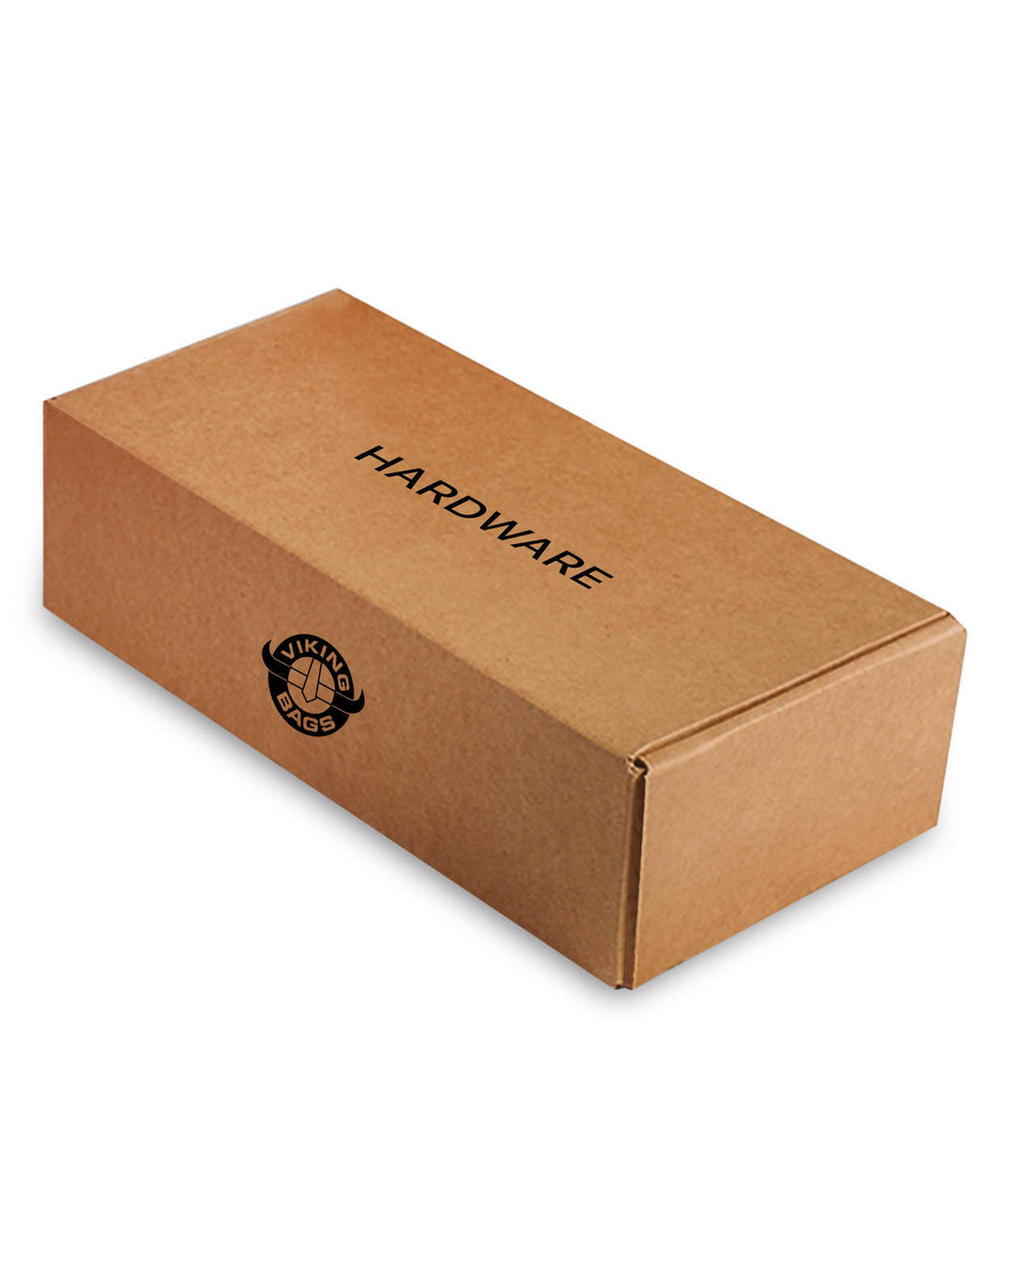 Honda VTX 1300 C Medium SS Slanted Motorcycle Saddlebags Hardware Box